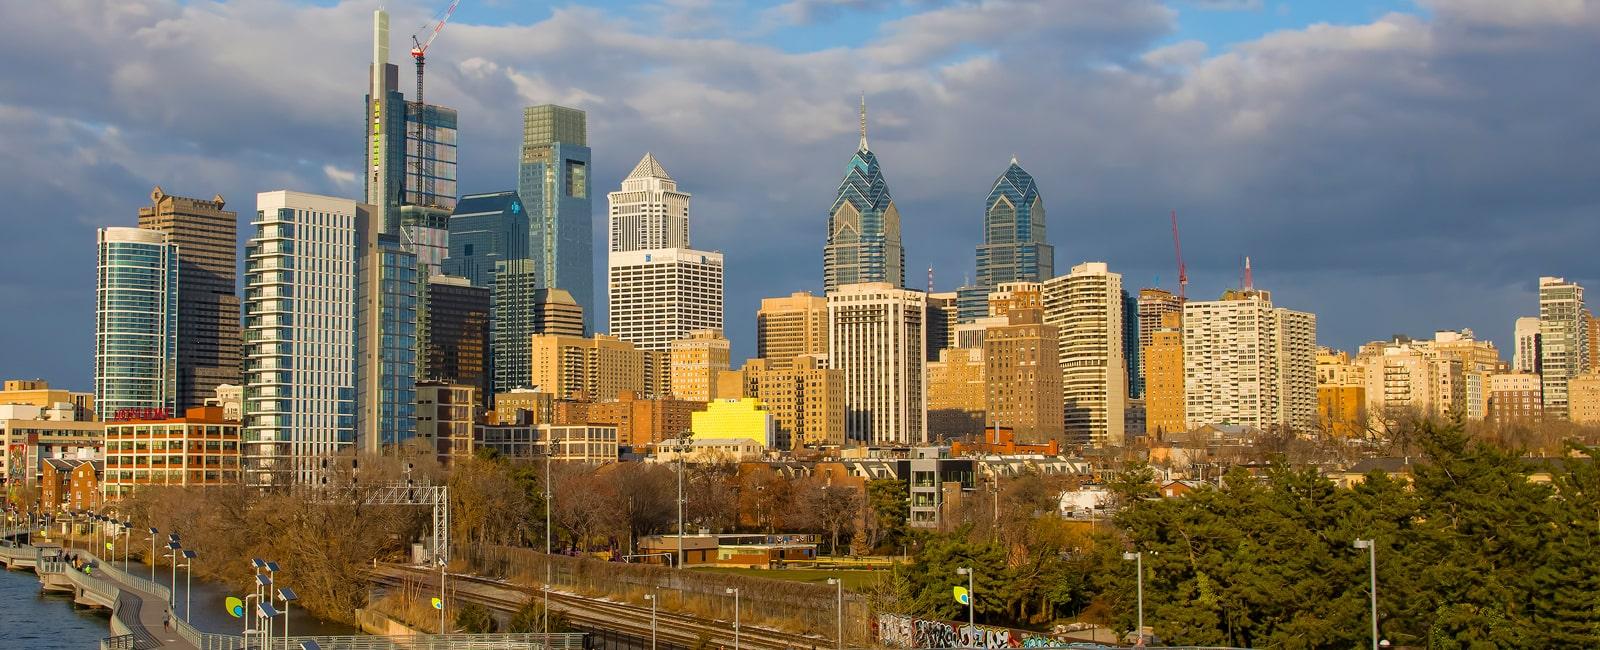 National Tooling & Machining Association, Philadelphia Delaware Valley Chapter, NTMA